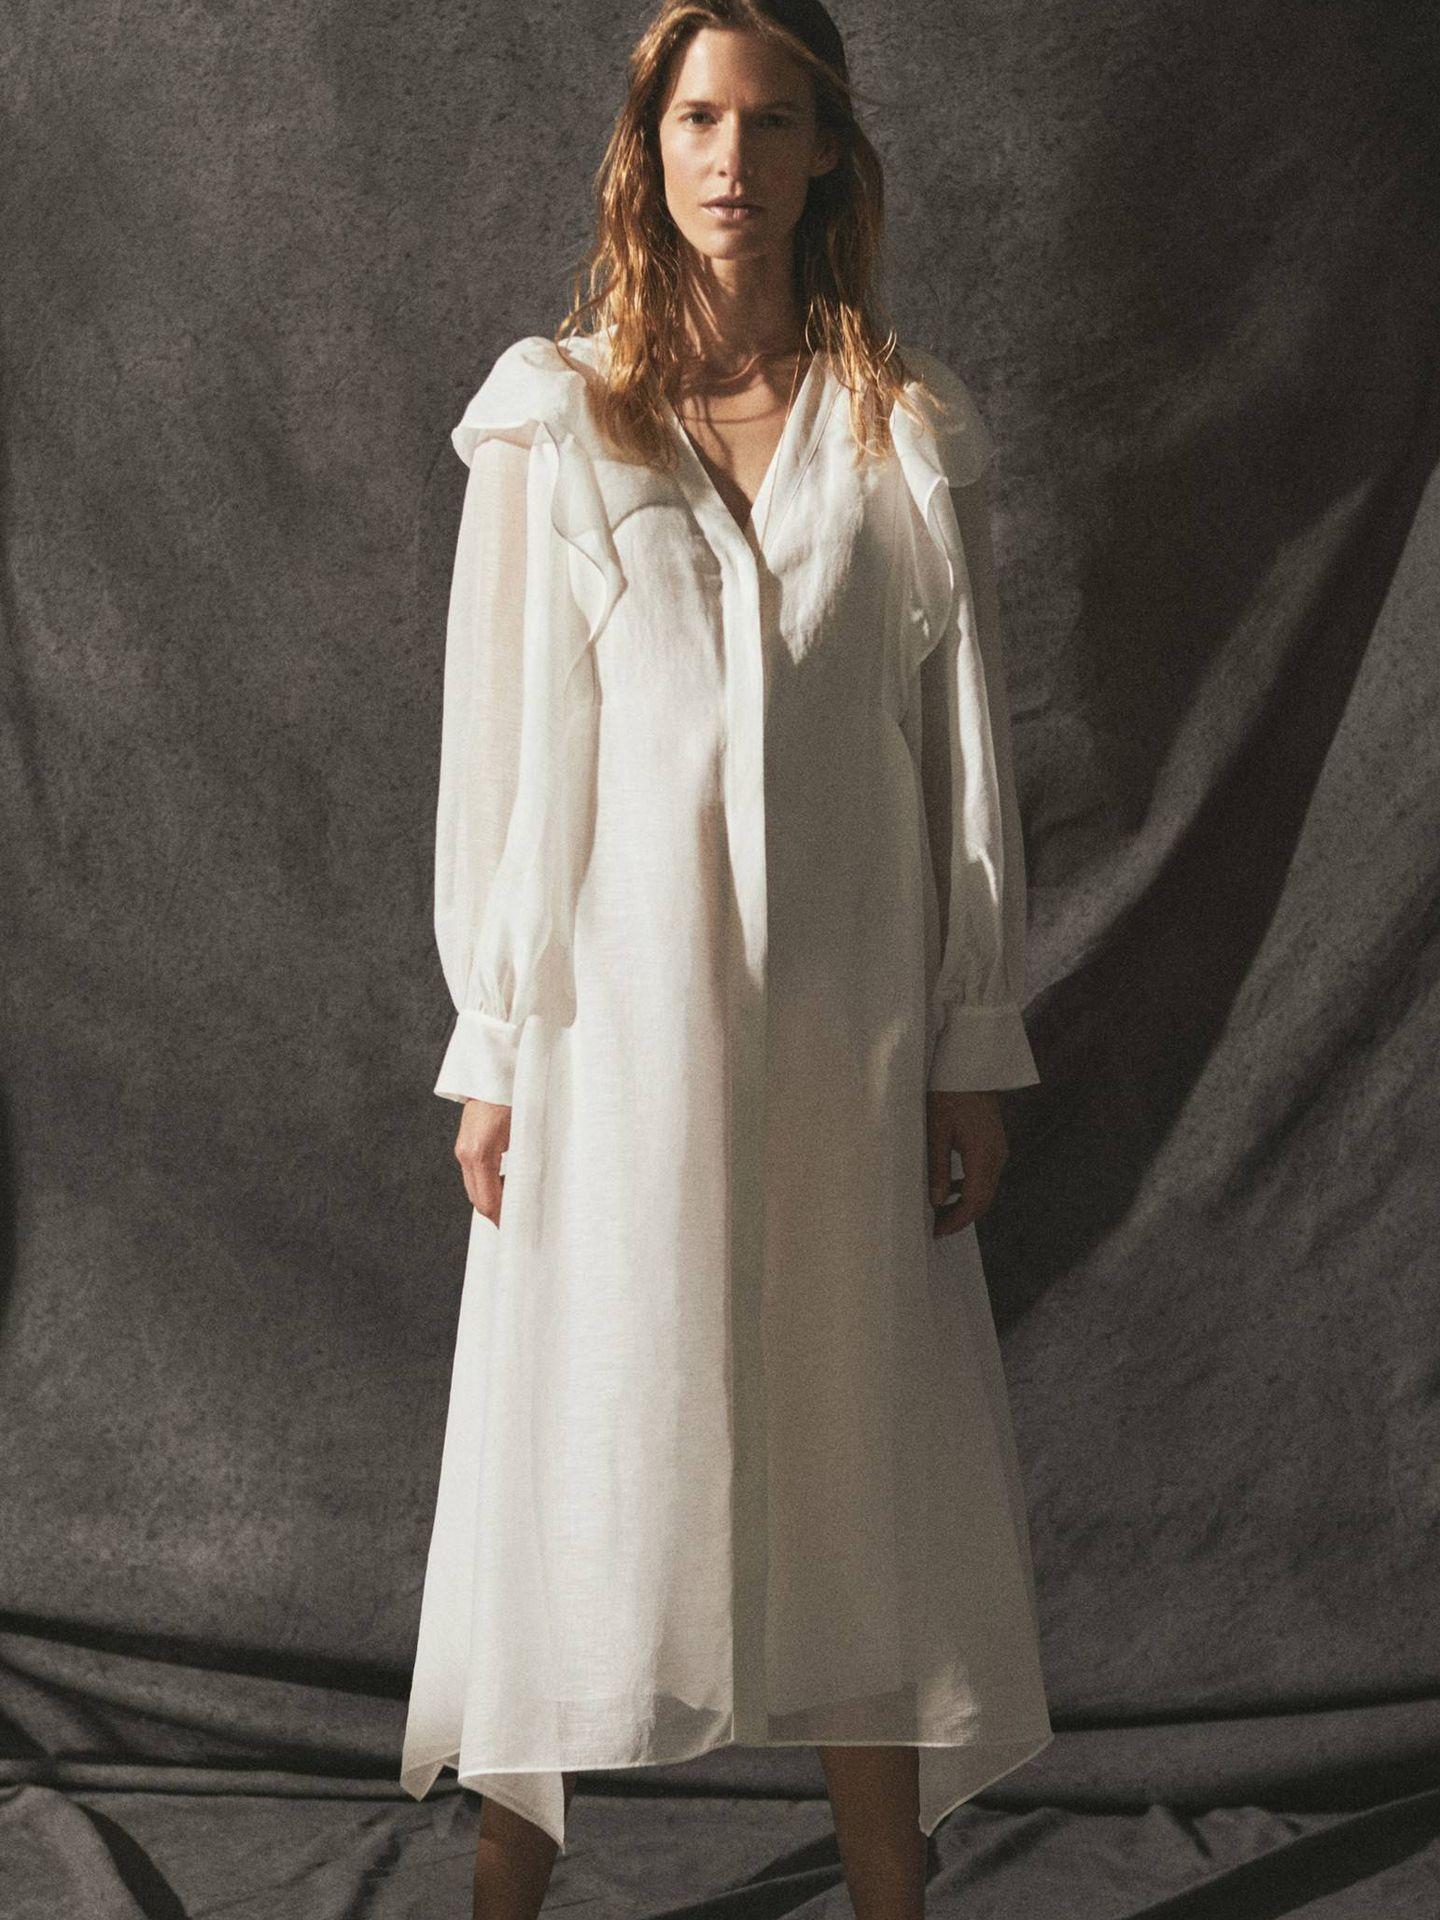 Vestido blanco de Massimo Dutti. (Cortesía)